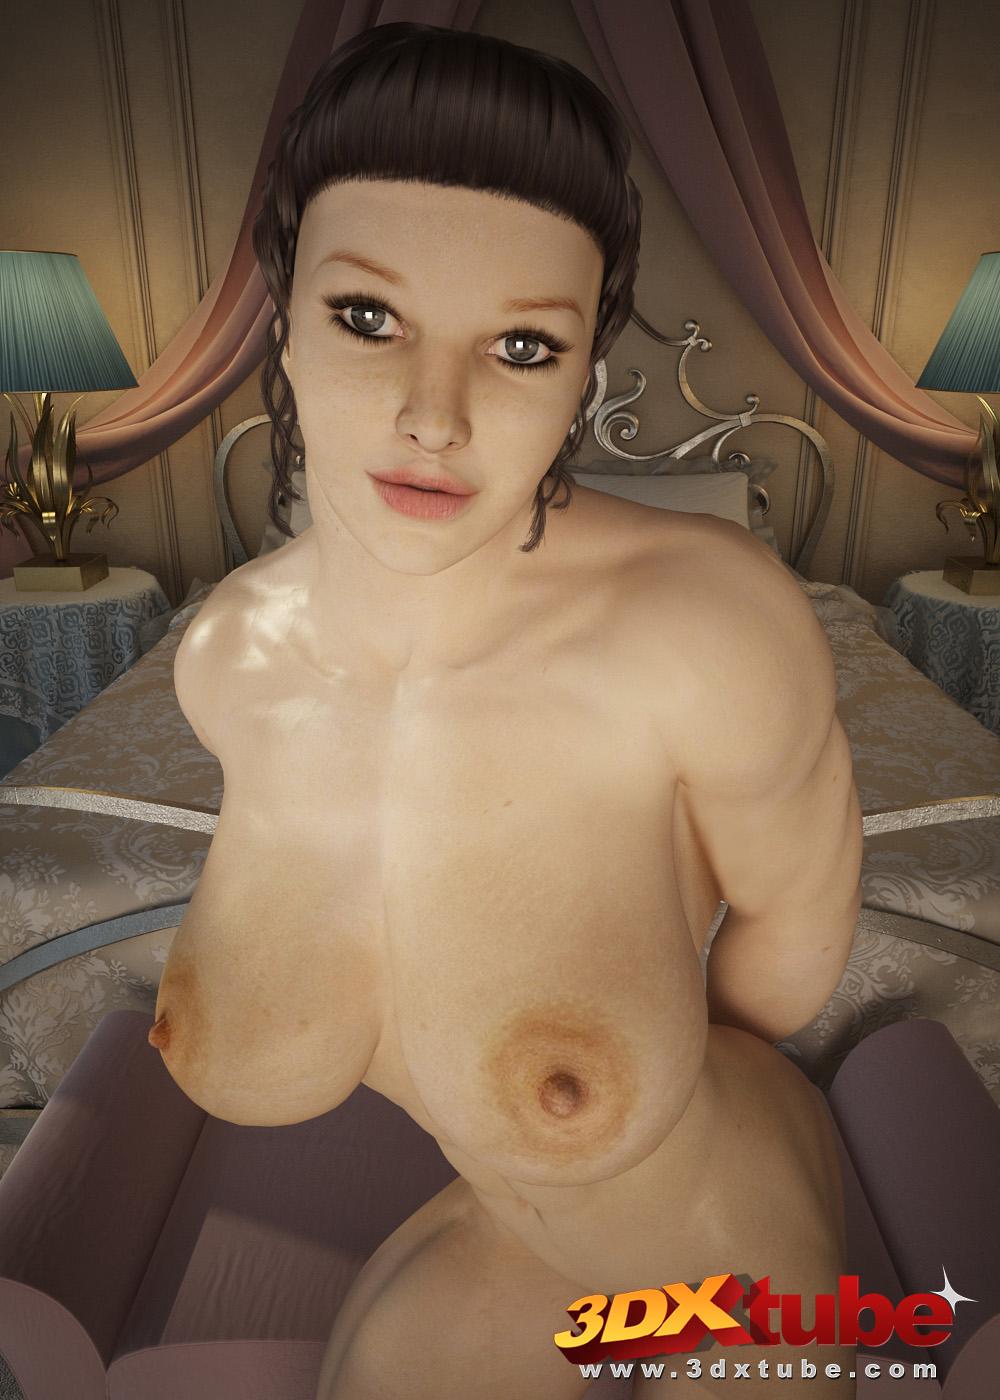 3dporn boobies xxx pron download